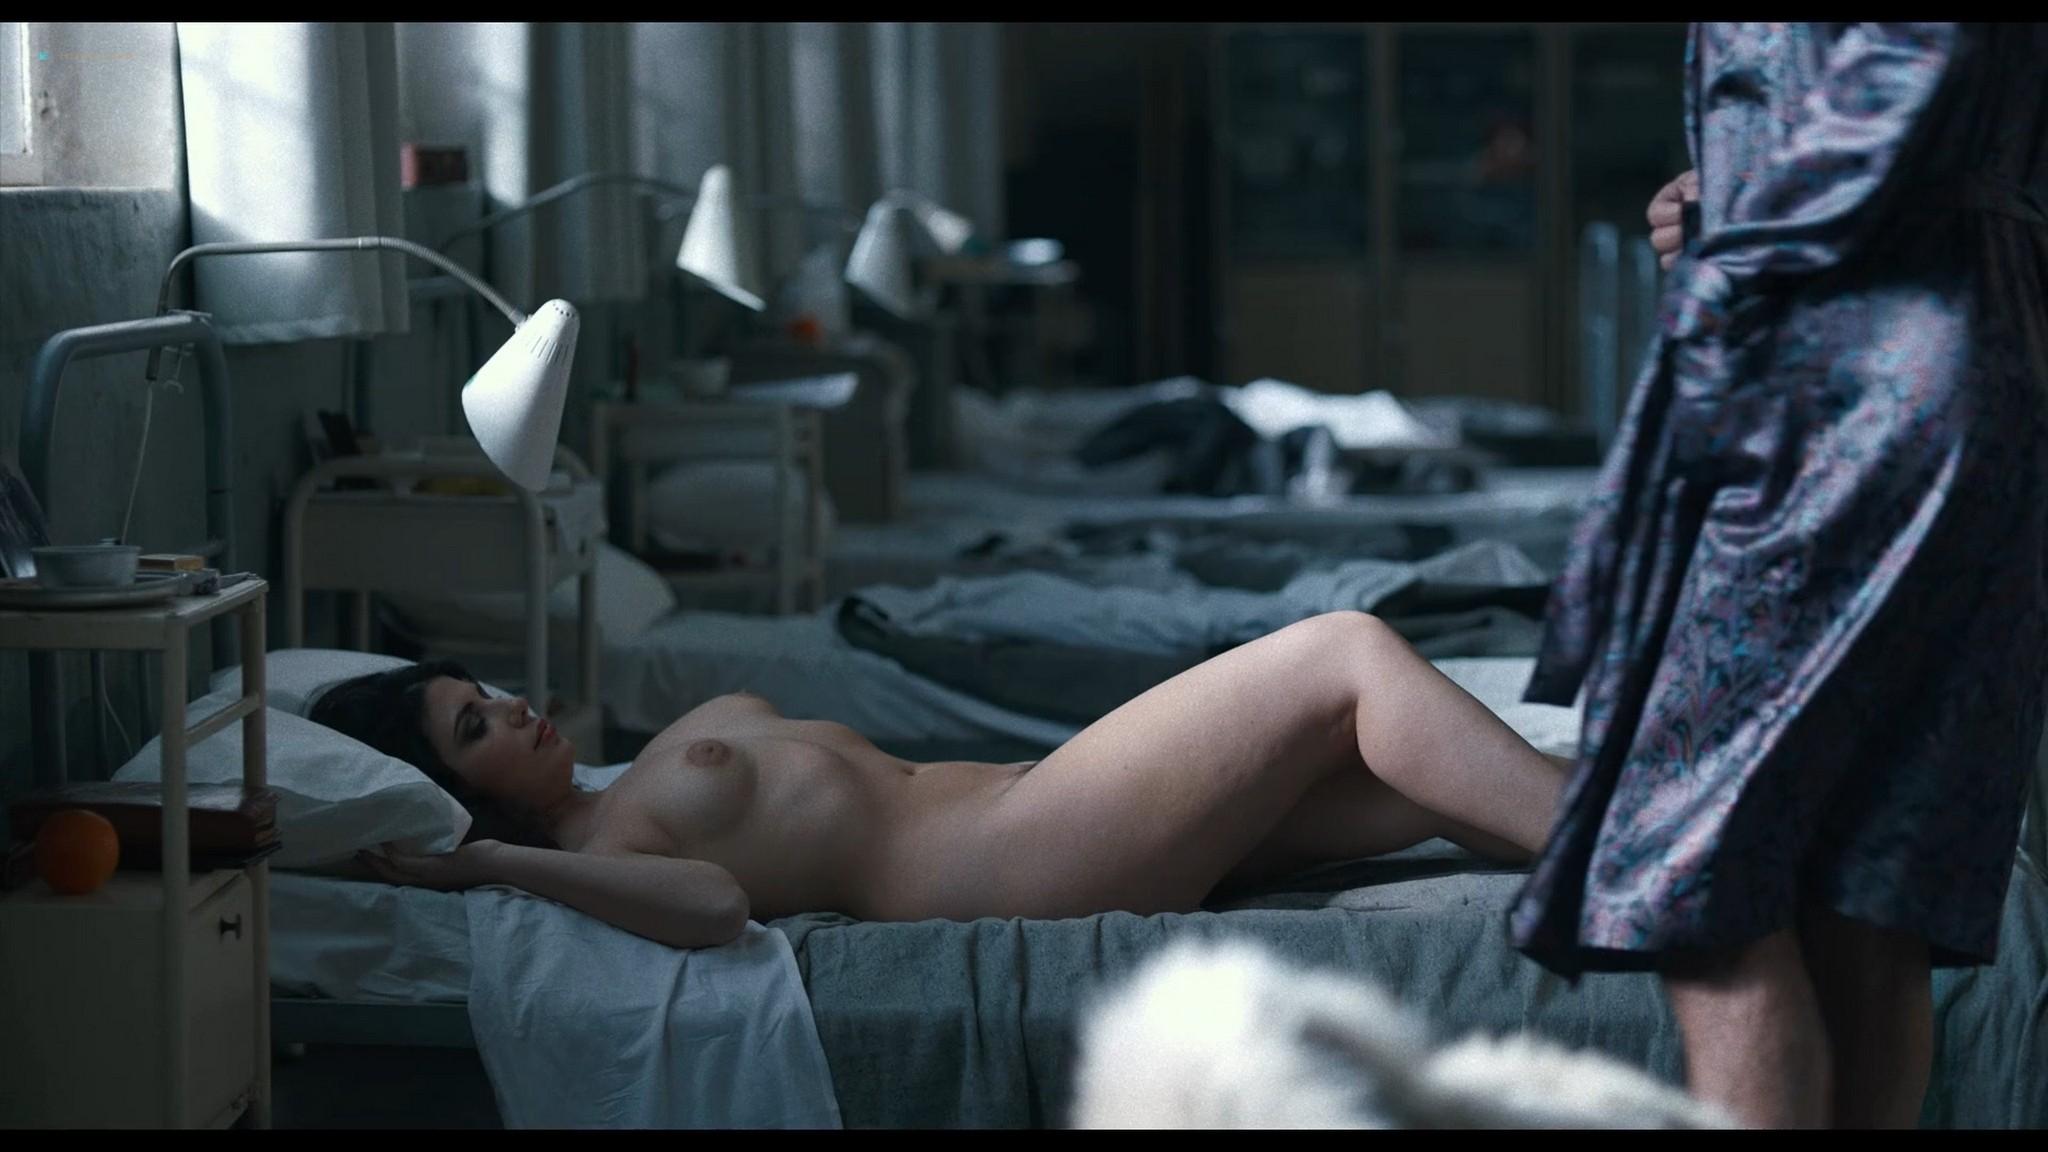 Maria Fernanda Cândido nude Marilina Marino nude sex - The Traitor (2019) HD 1080p BluRay (6)